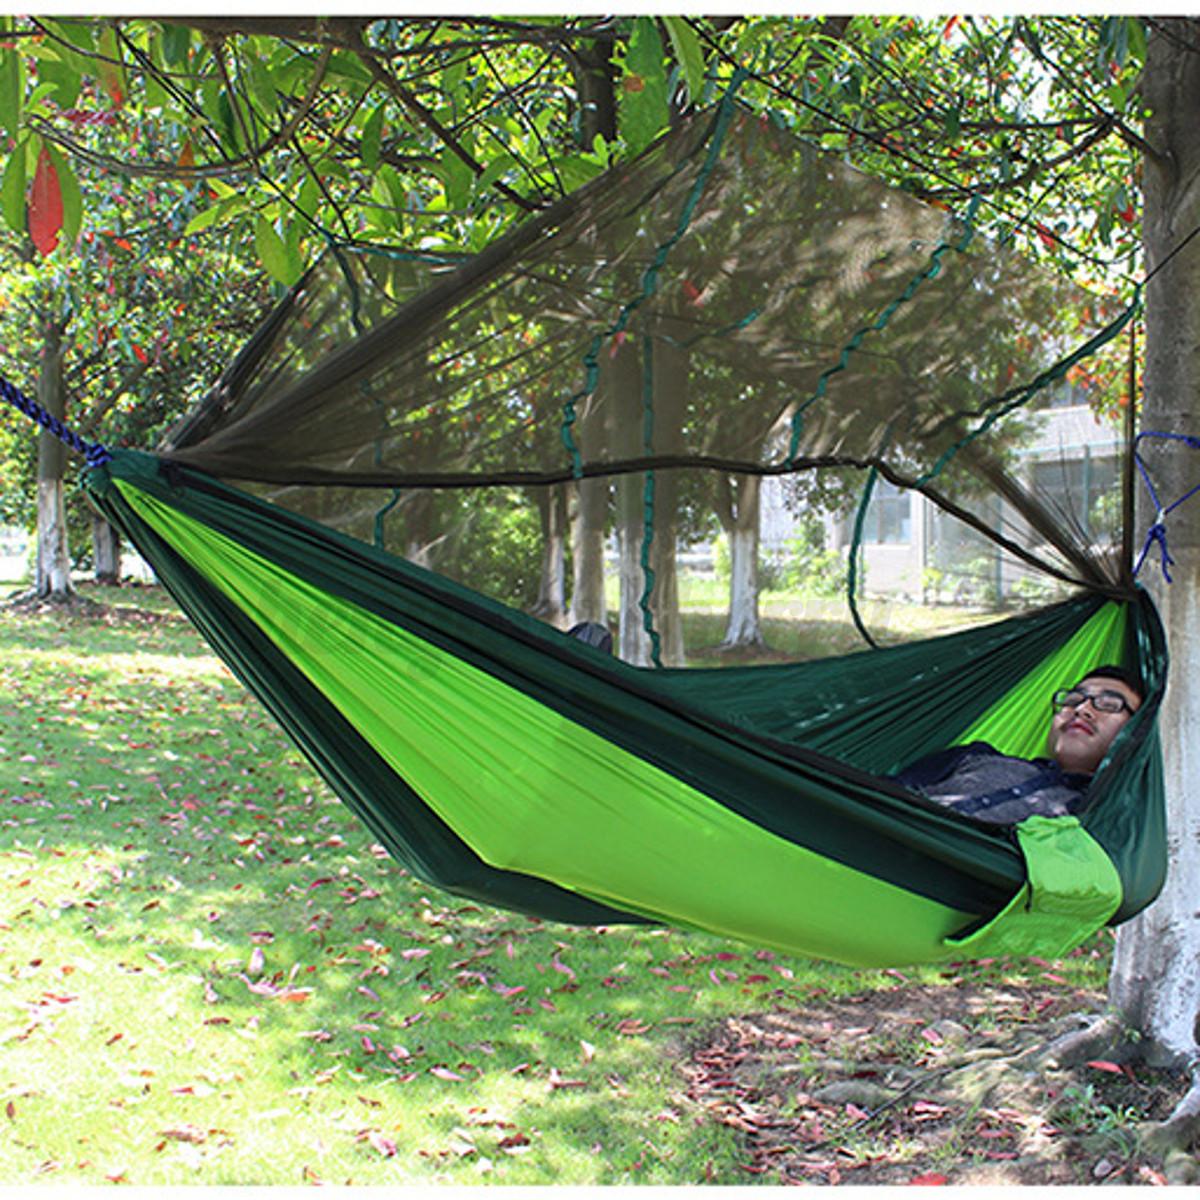 Outdoor Double Hammock Camping Mesh Bed Swing Mosquito Net